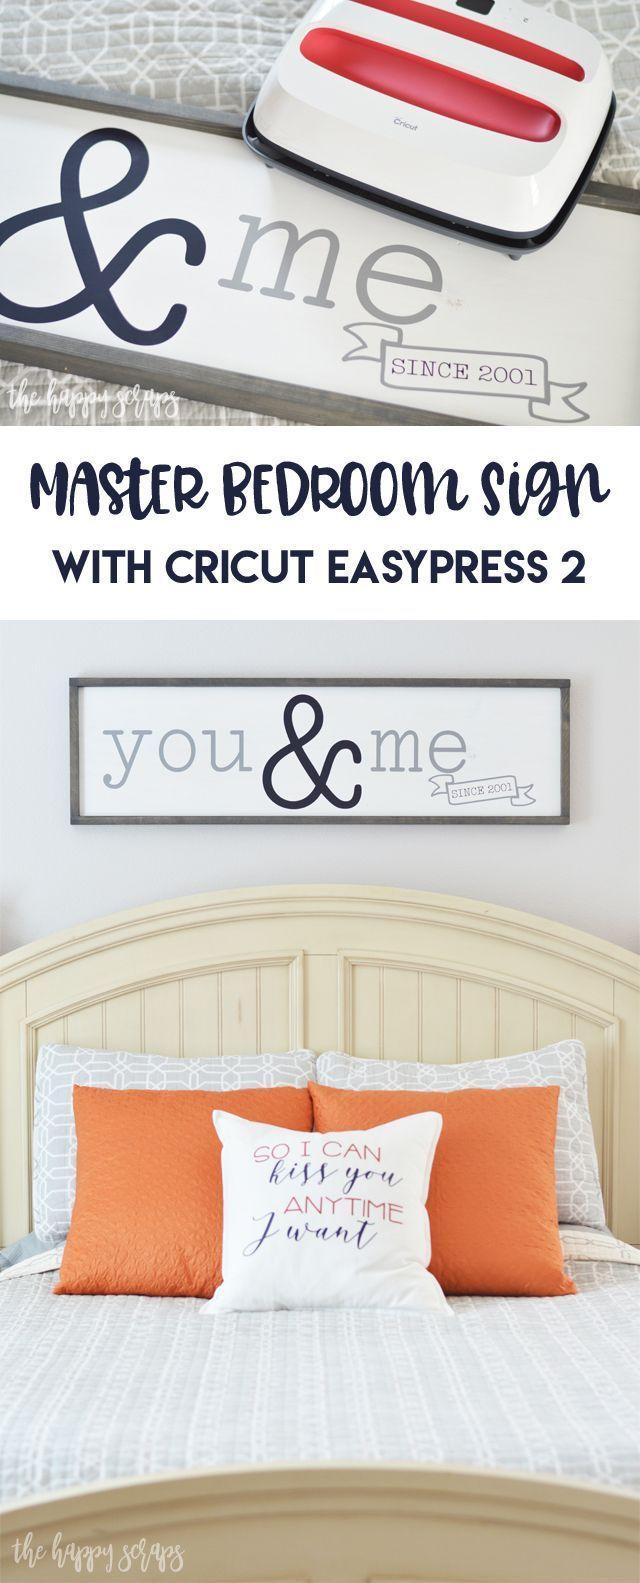 Master Bedroom Sign with Cricut EasyPress 2 Bedroom